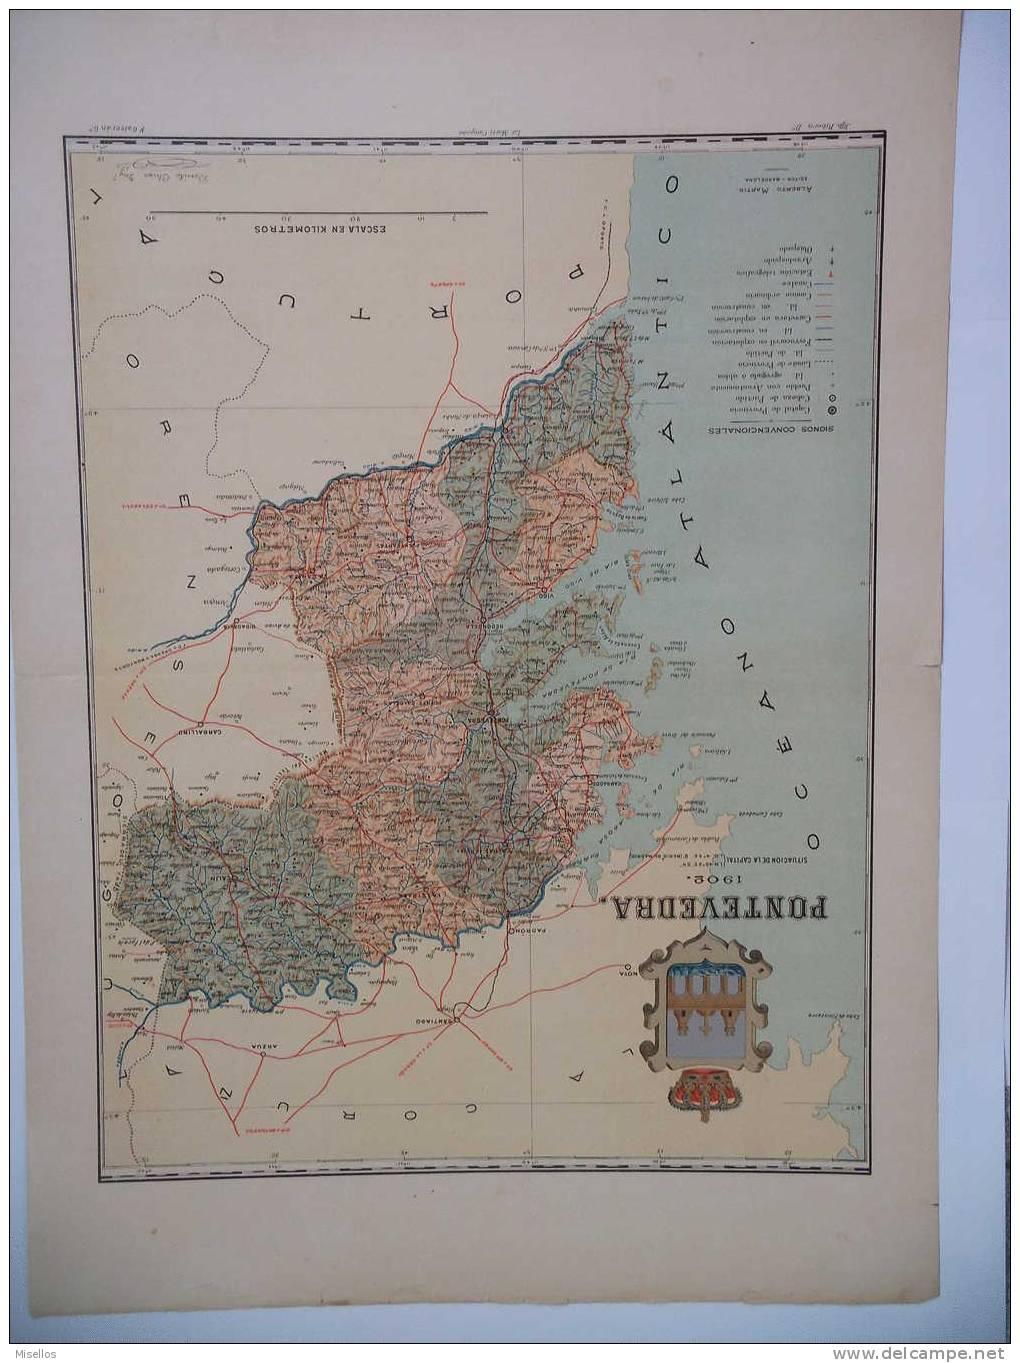 Lote Mapas Galicia: La Coruña + Lugo + Orense Y Pontevedra - Mapas Geográficas